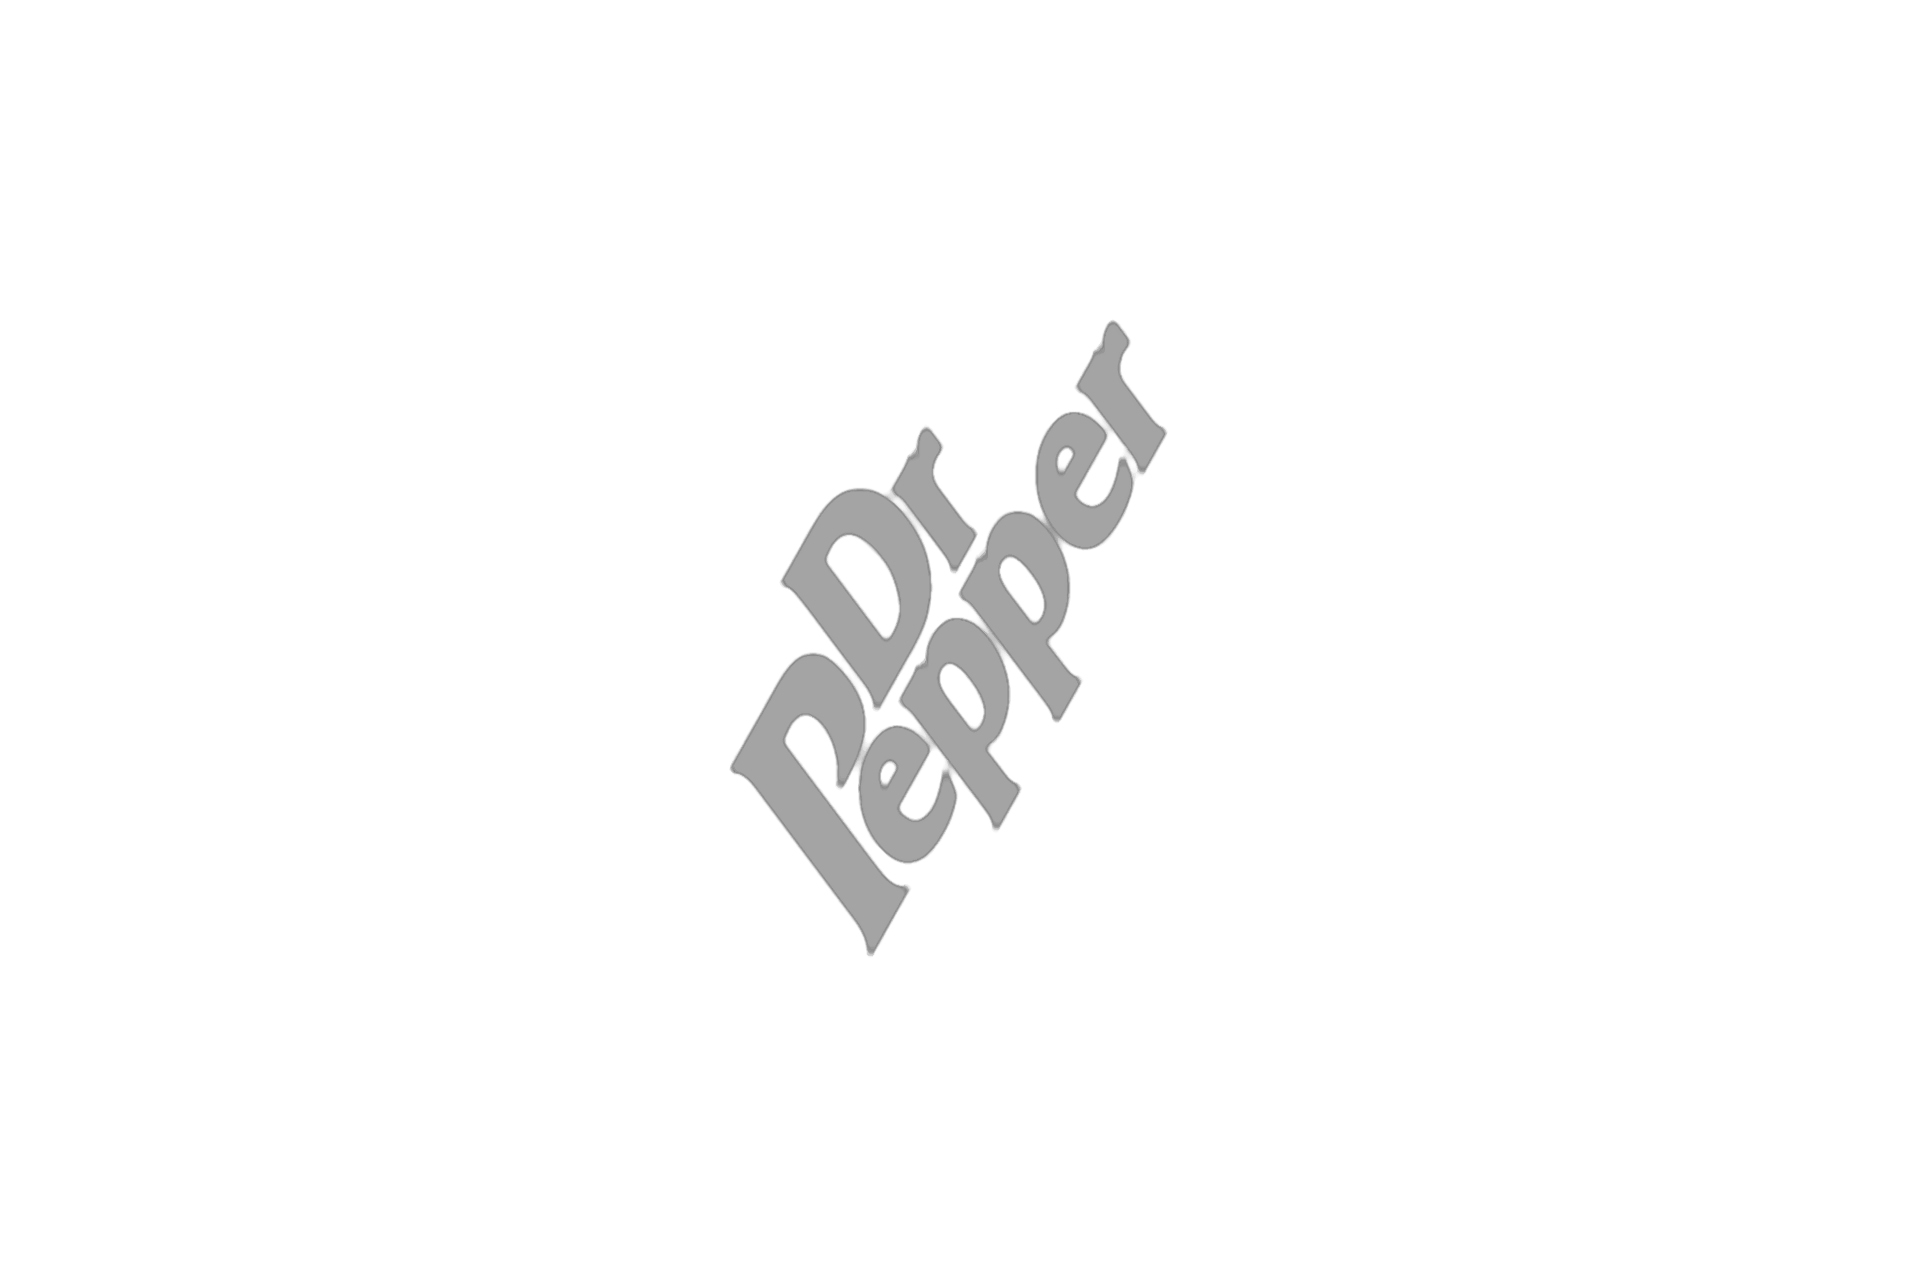 dr pepper logo grey